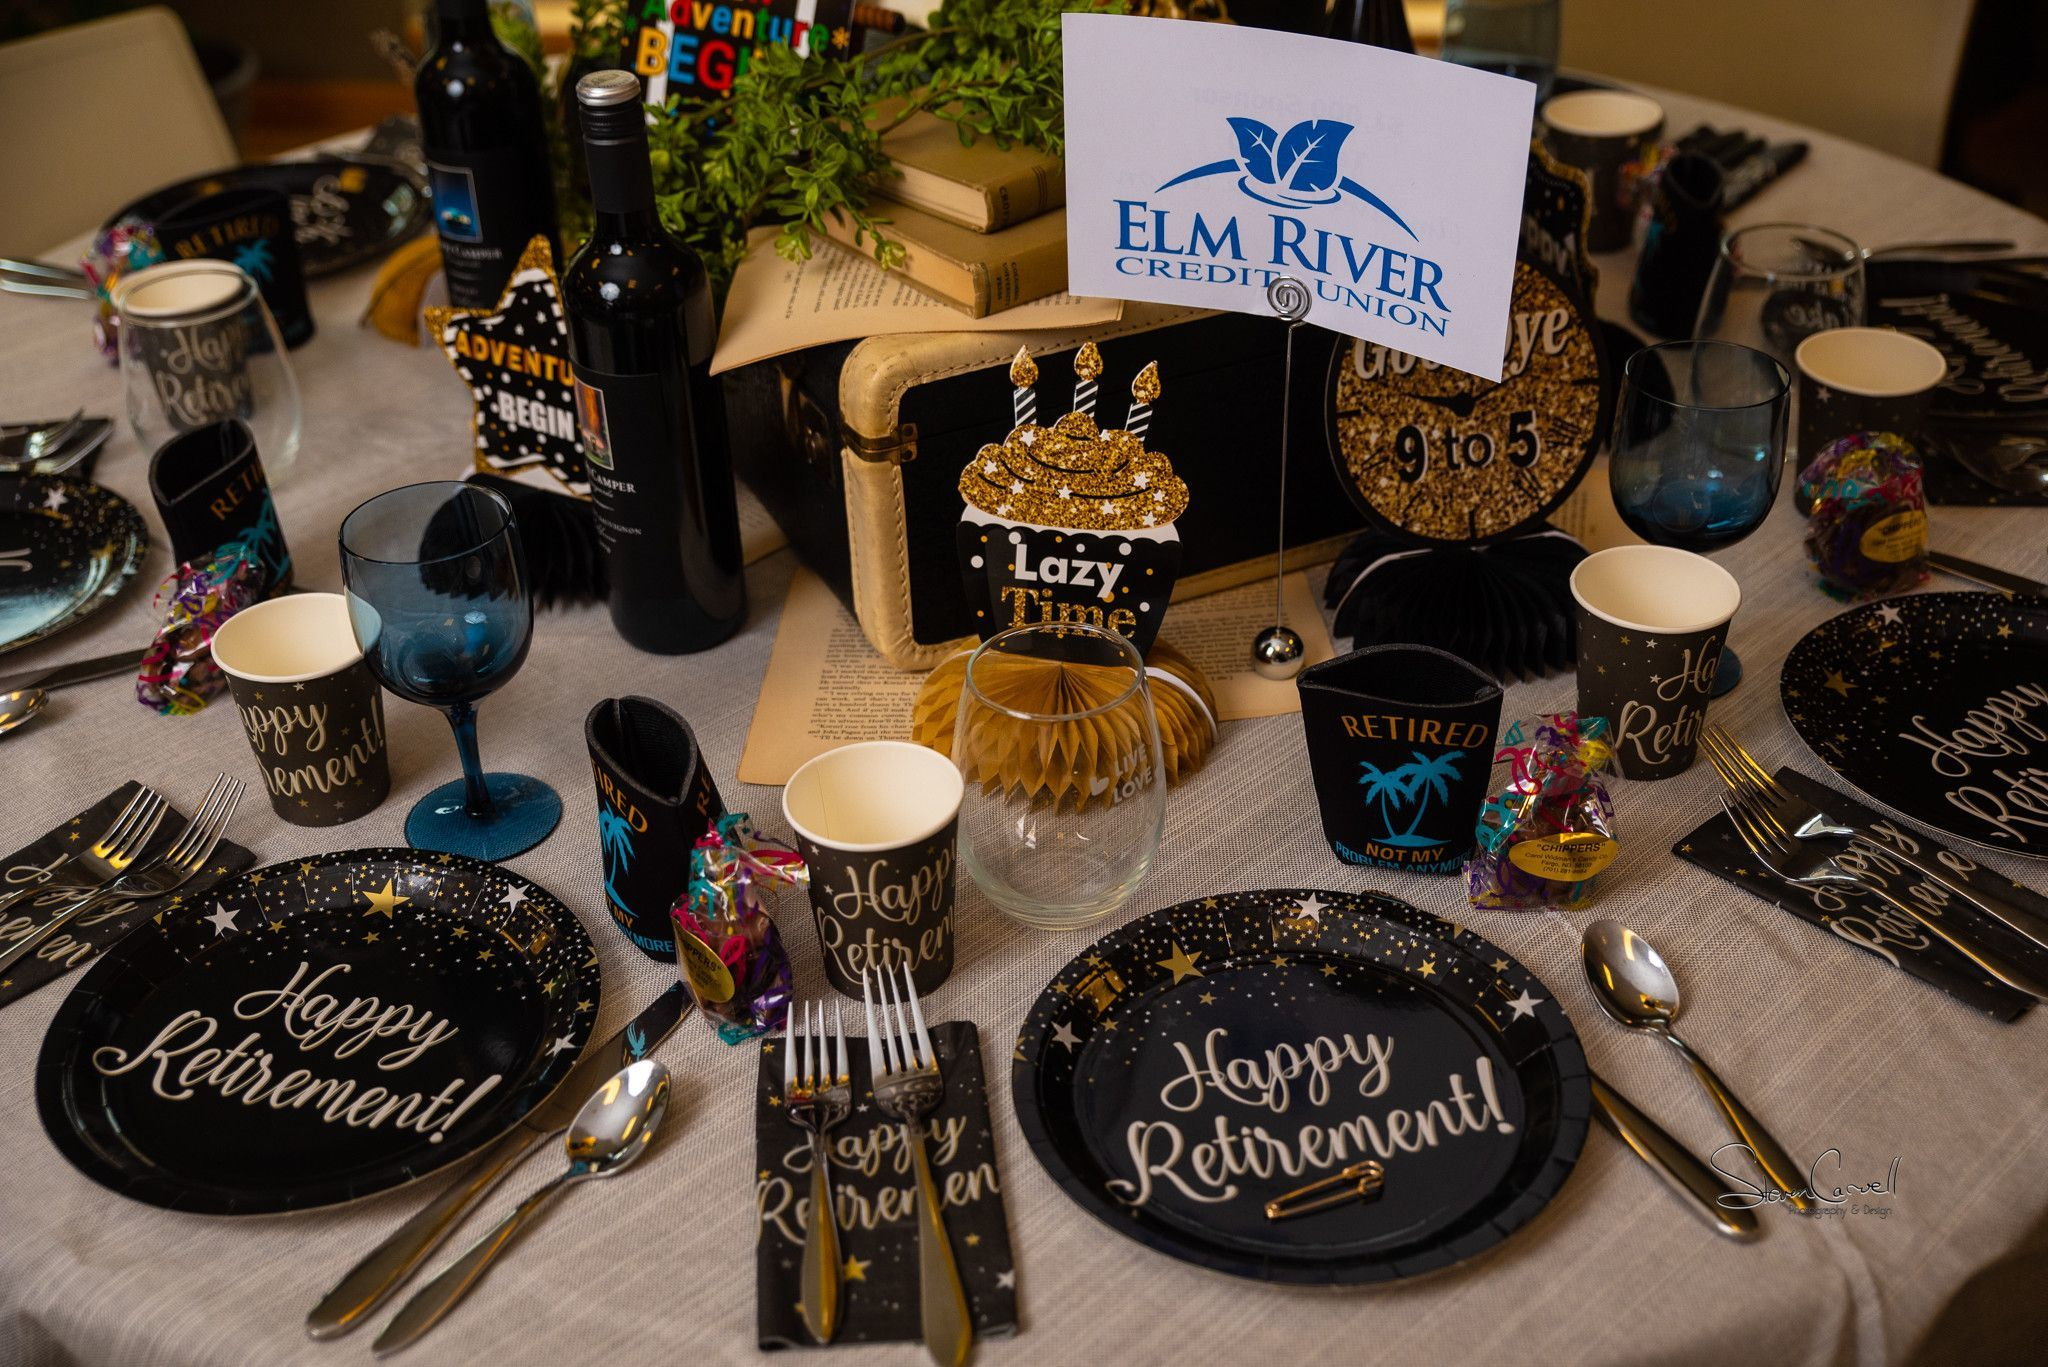 $1,000 sponsor - Elm River Credit - Happy Retirement